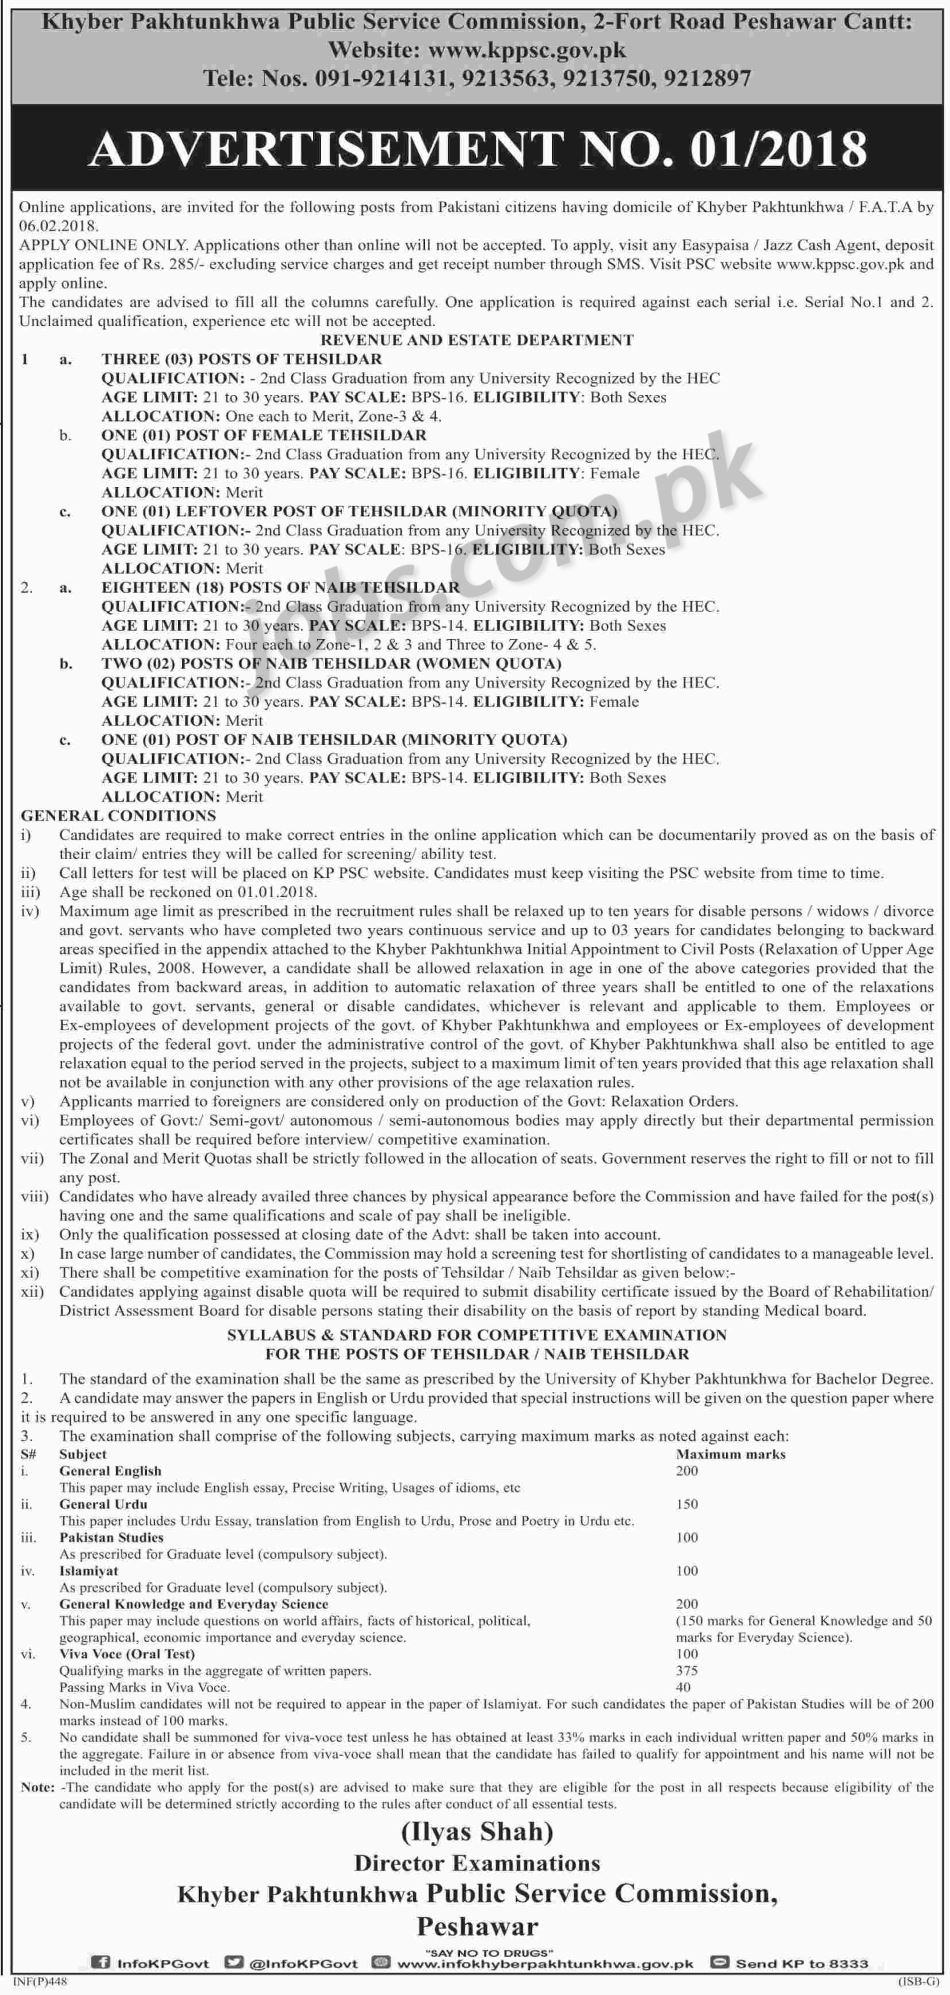 KPPSC-dw Online Govt Job Form Submit on